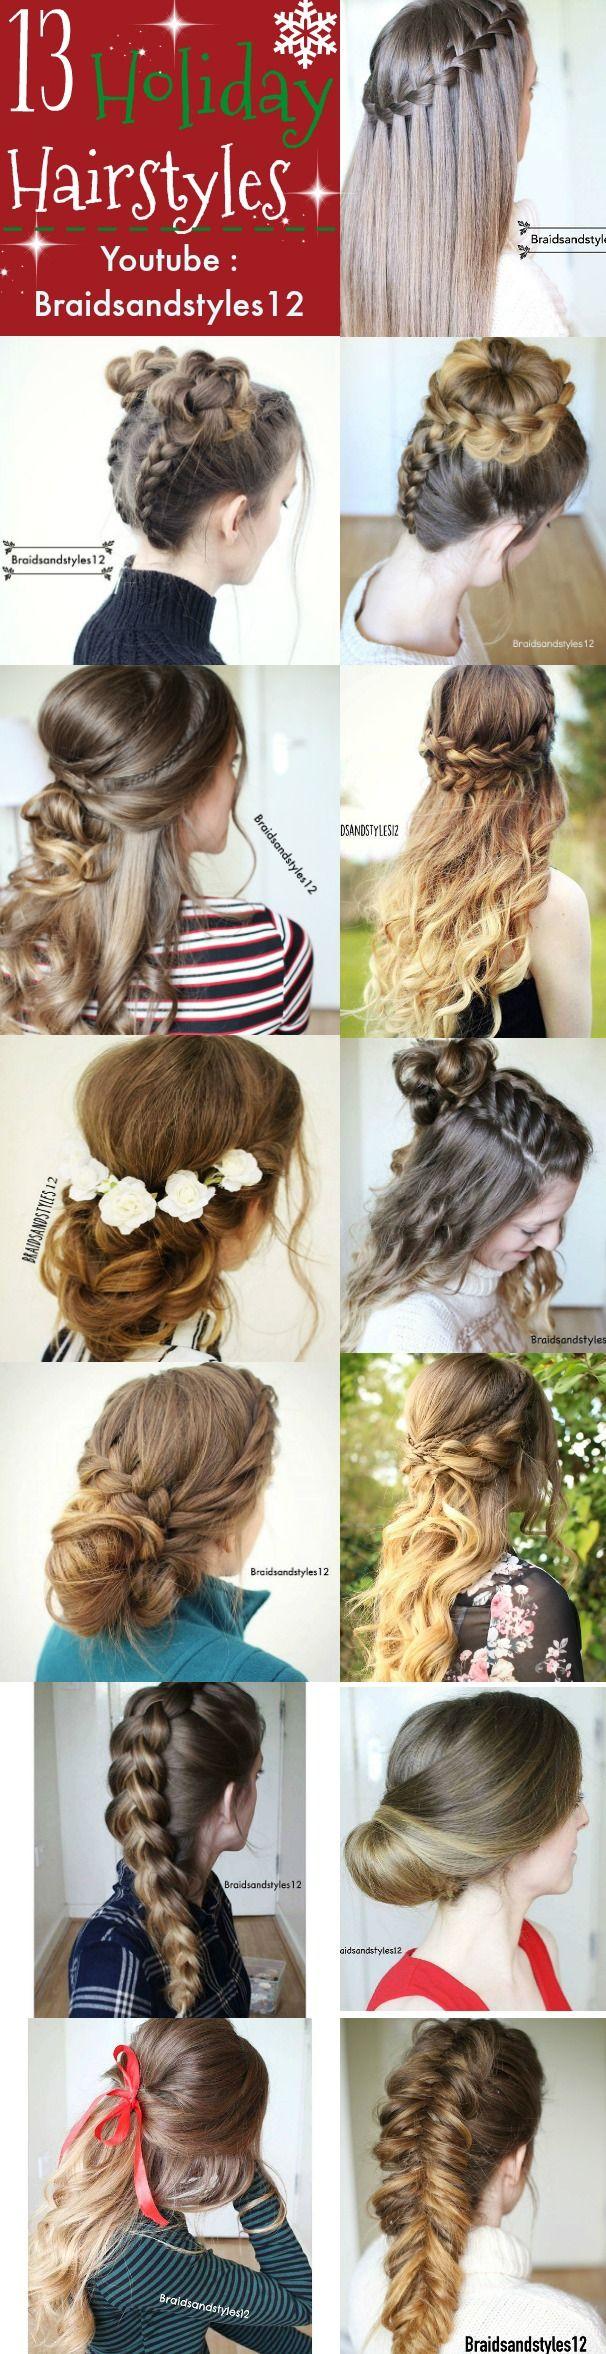 Holiday Hairstyle Ideas / Christmas Holidays Hair Ideas by Braidsandstyles12. Tutorials : https://www.youtube.com/channel/UC8ouEGIBm1GNFabA_eoFbOQ